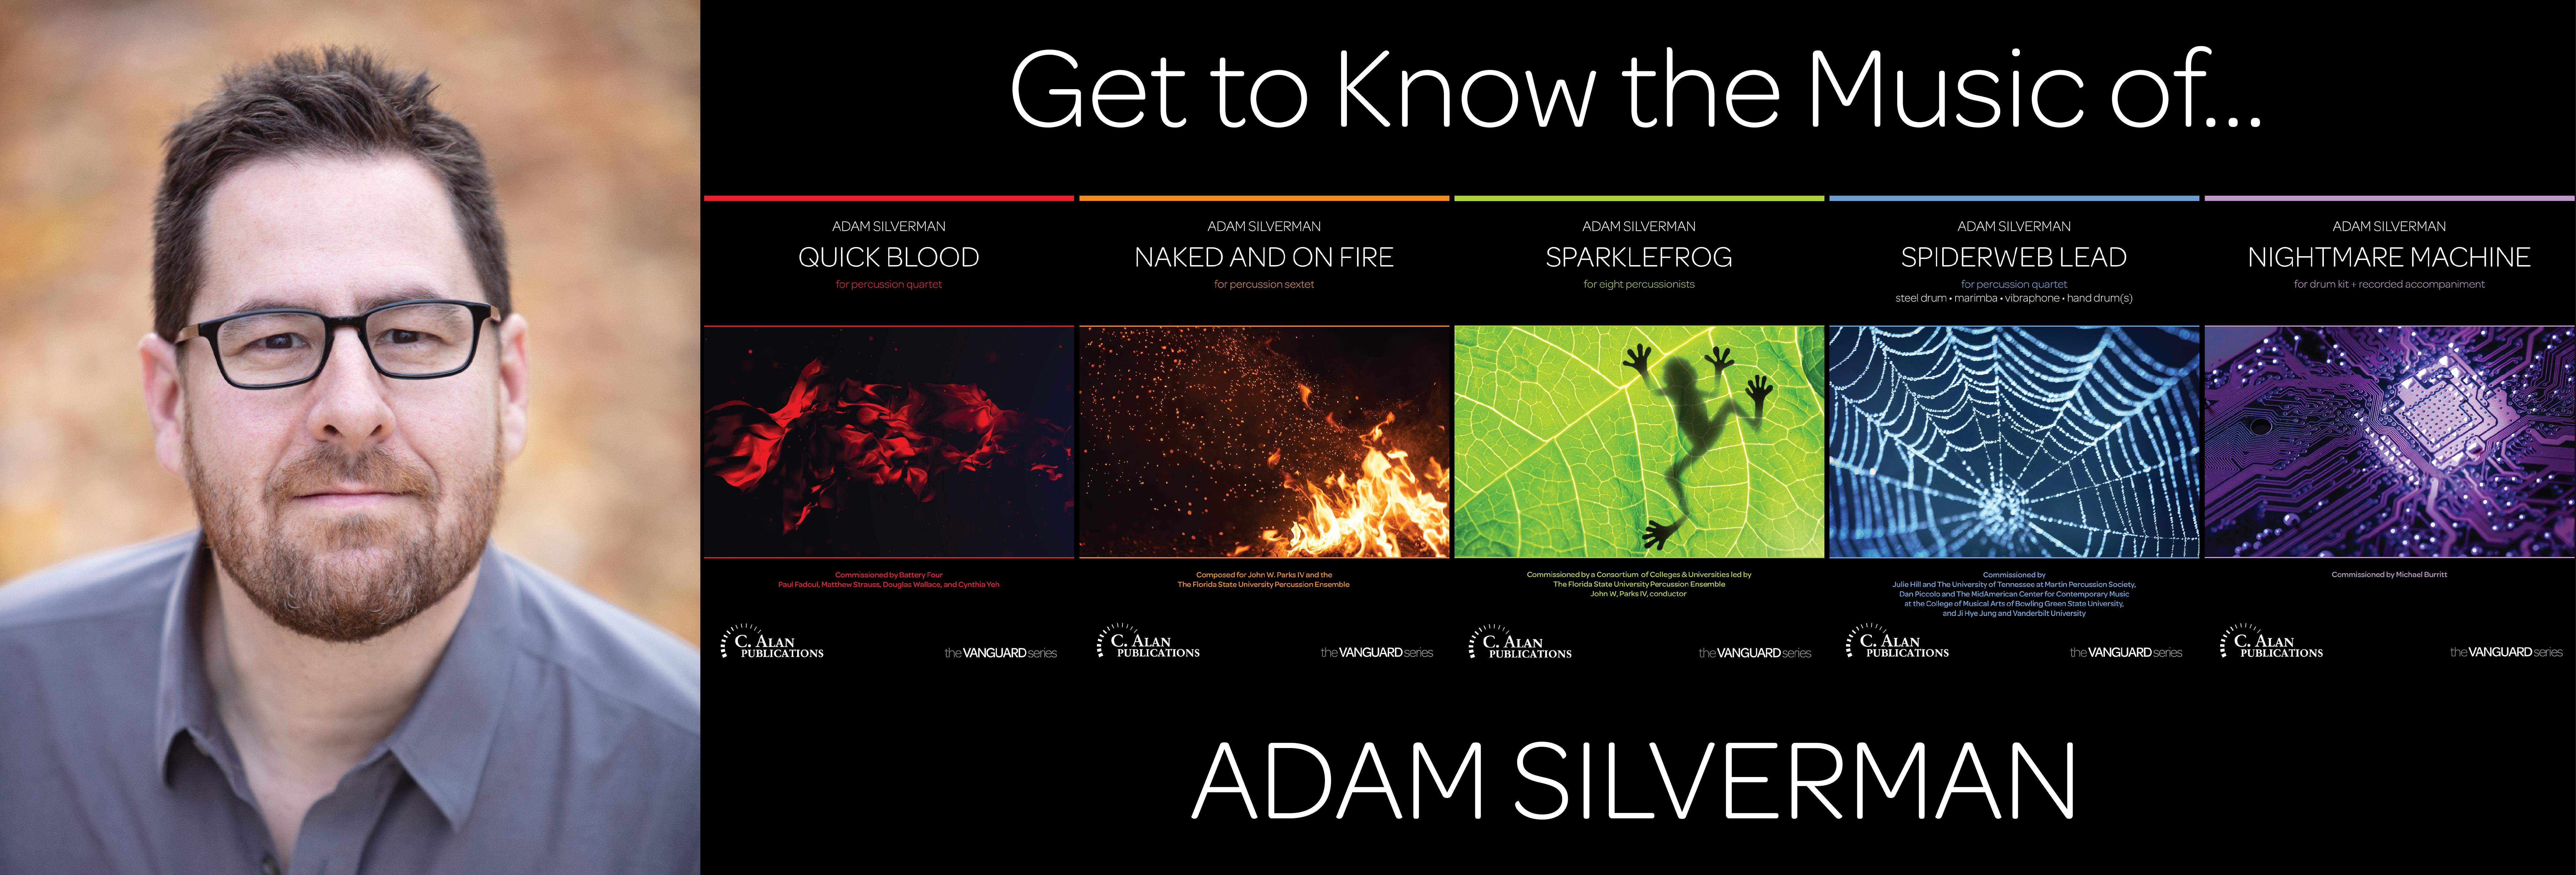 The Music of Adam Silverman